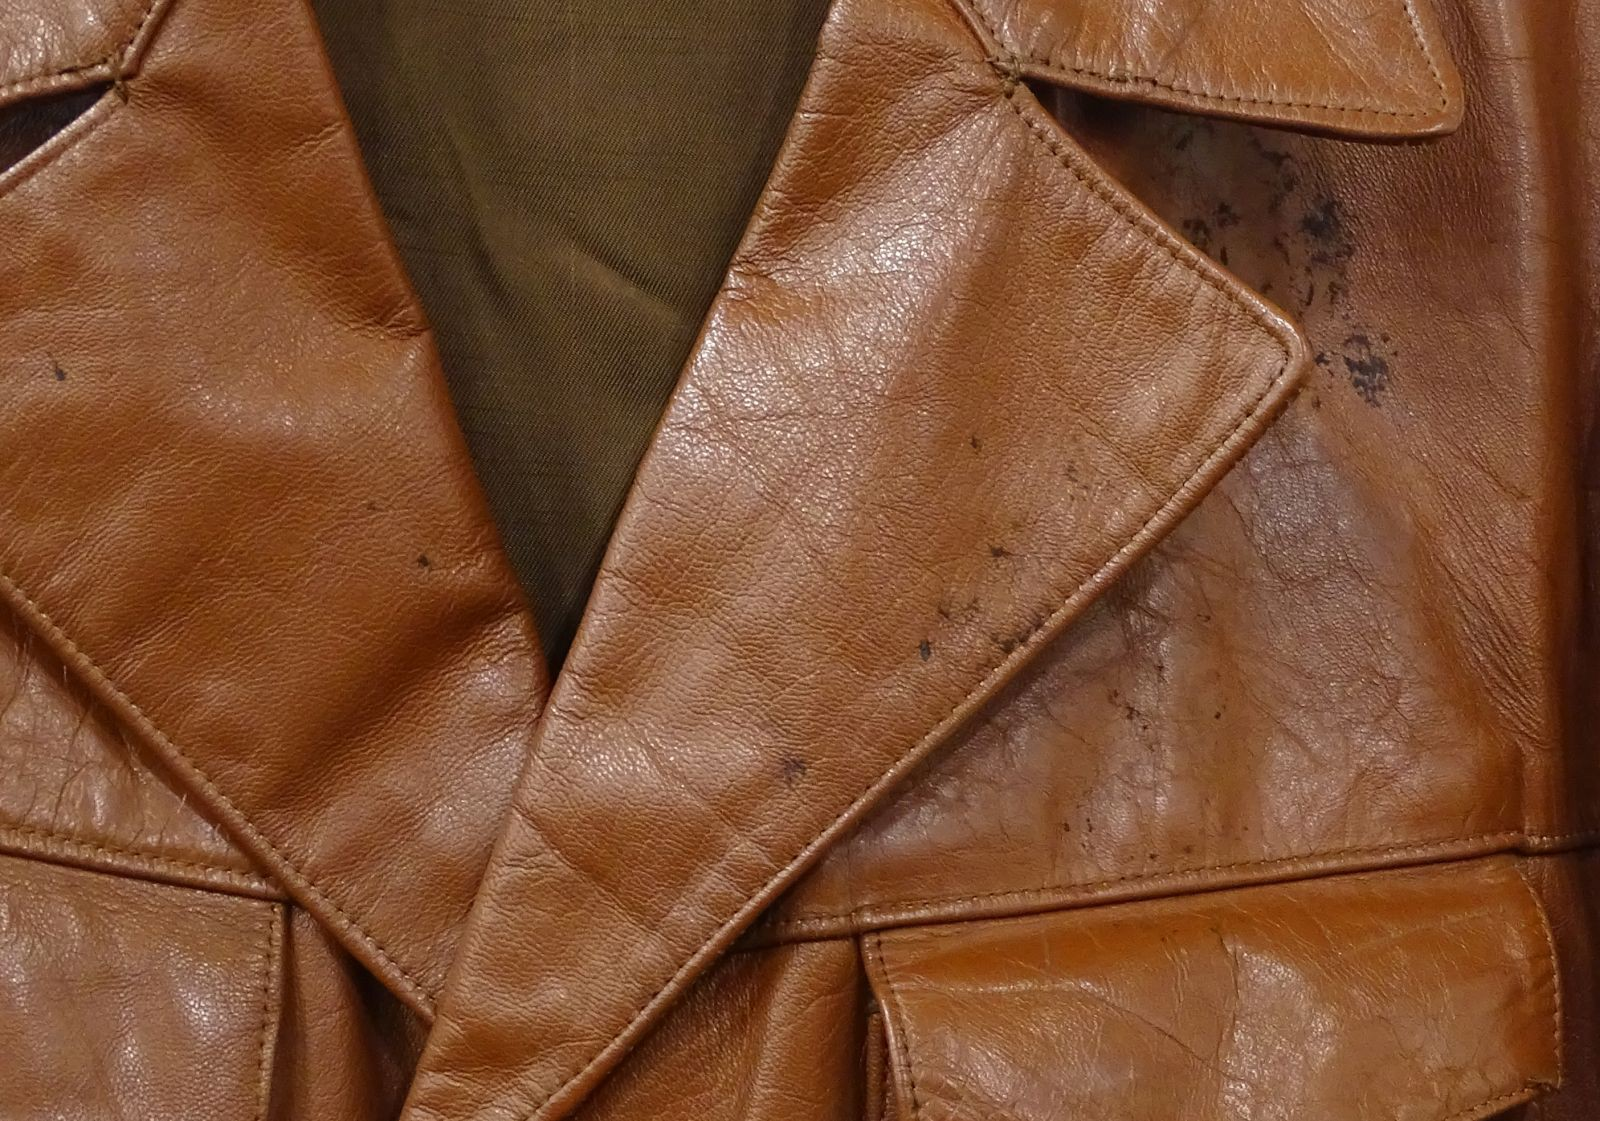 f43afb59e3 0U823 Régi barna férfi bőrkabát - 7800 Ft - (meghosszabbítva ...